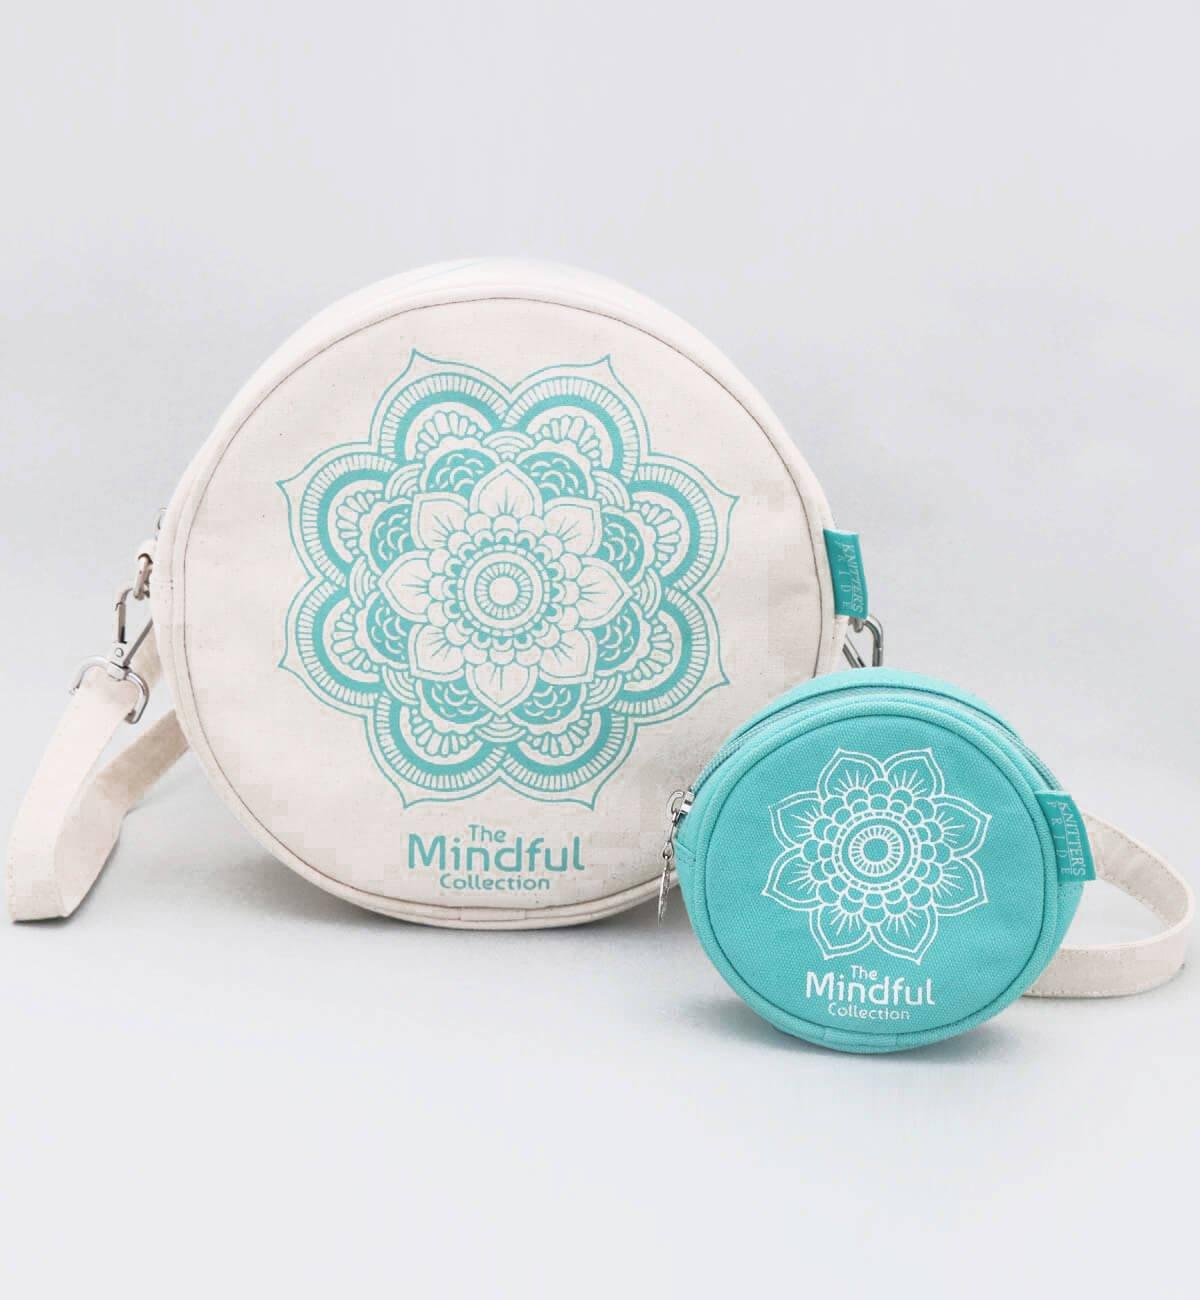 Mindful Collection Circular Bags